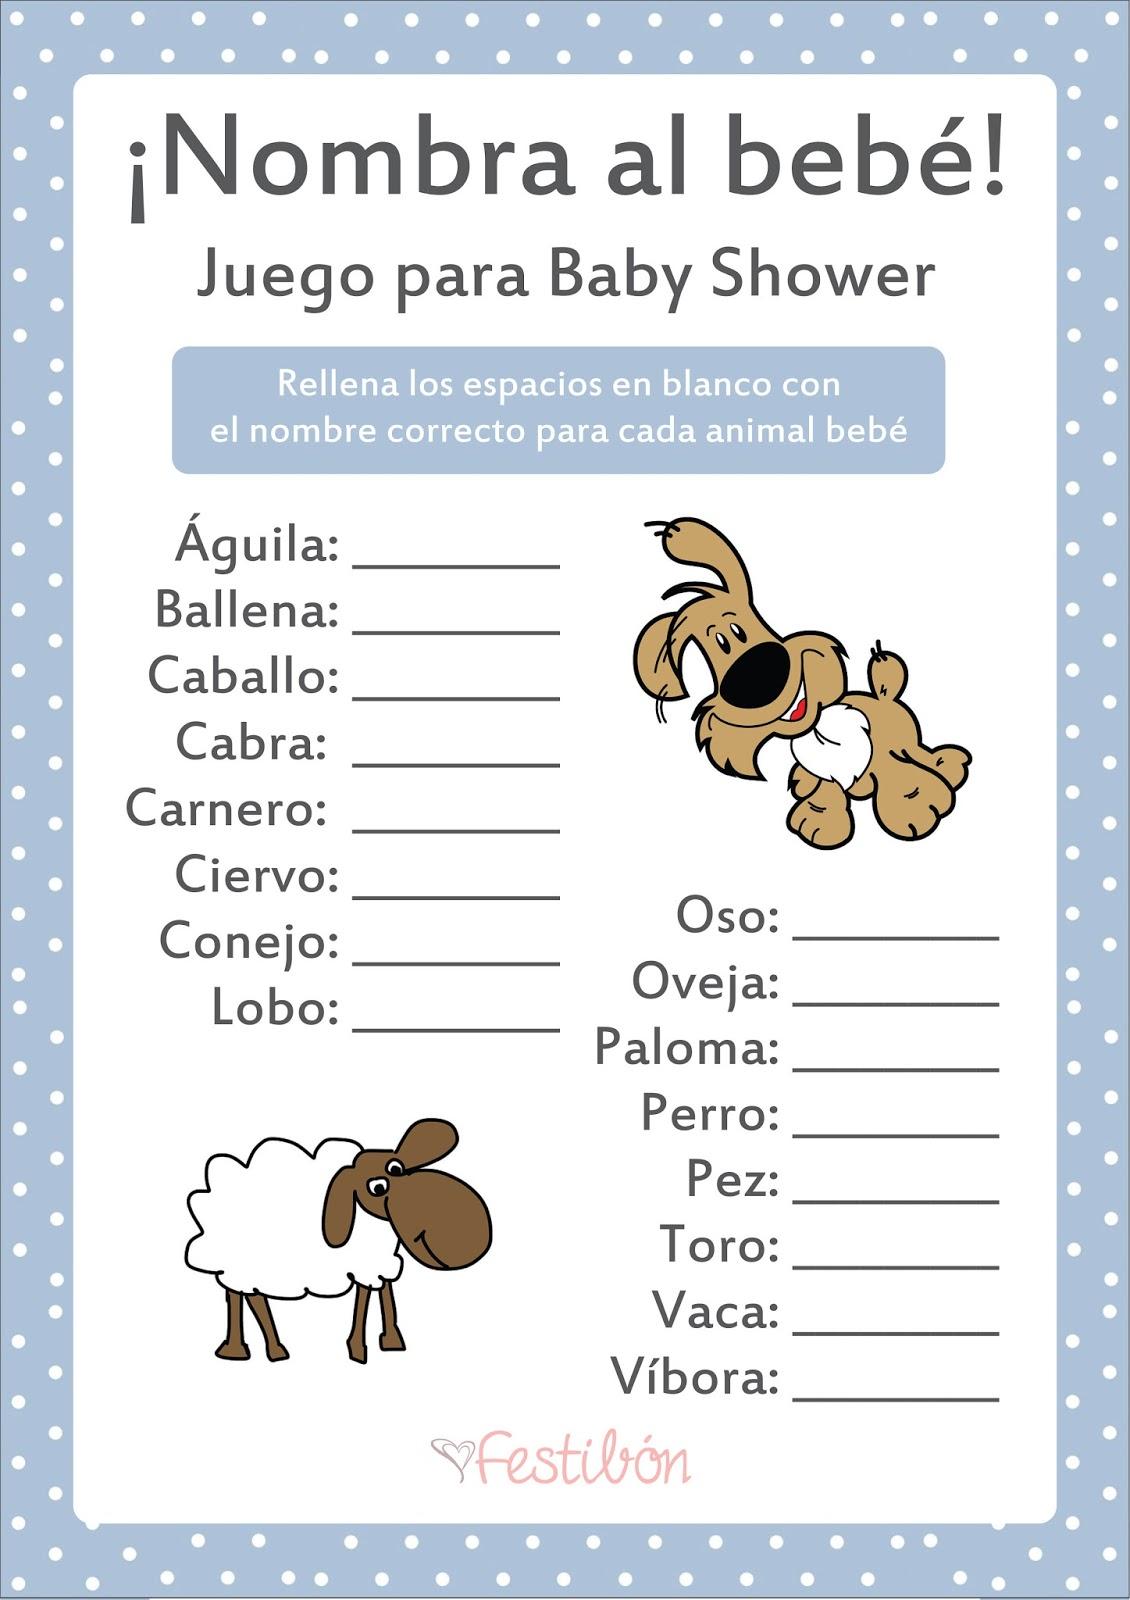 baby fartima fer baby baby abi ale shower shower carla detalles shower